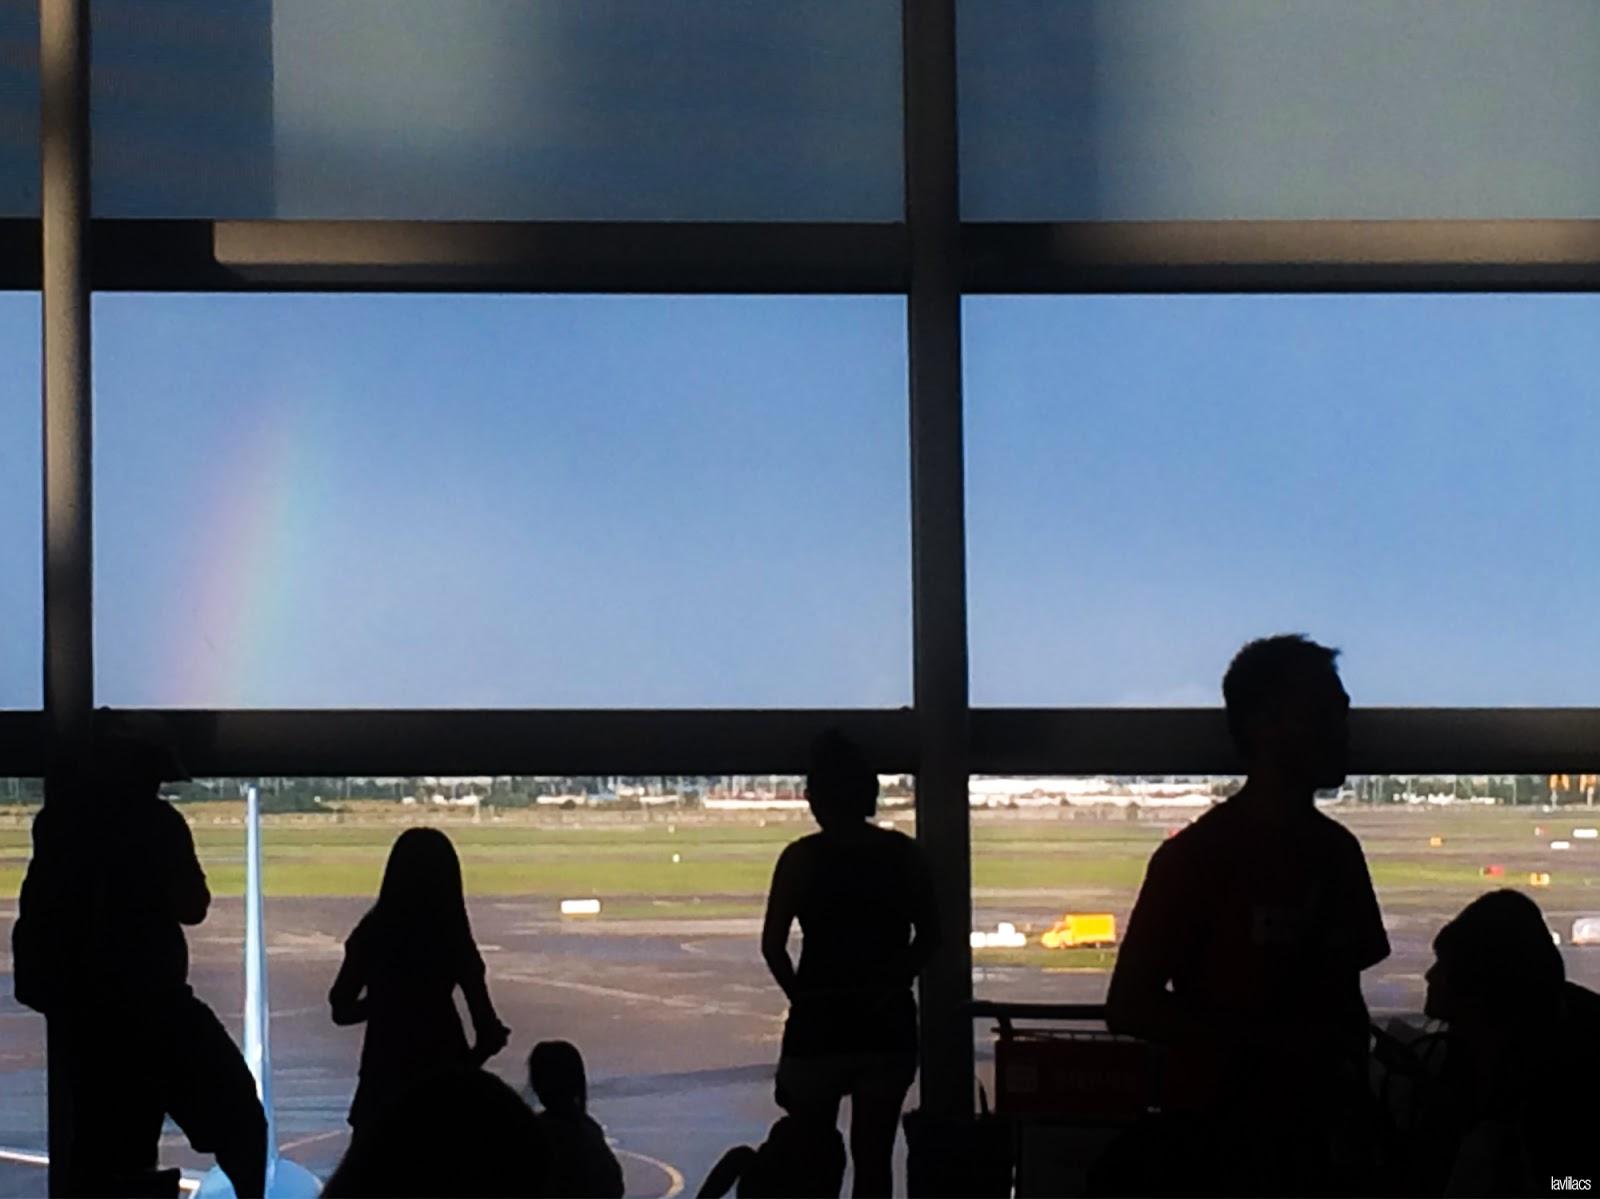 Seoul, Korea - Summer Study Abroad 2014 - Rainbow spotting and a delayed flight